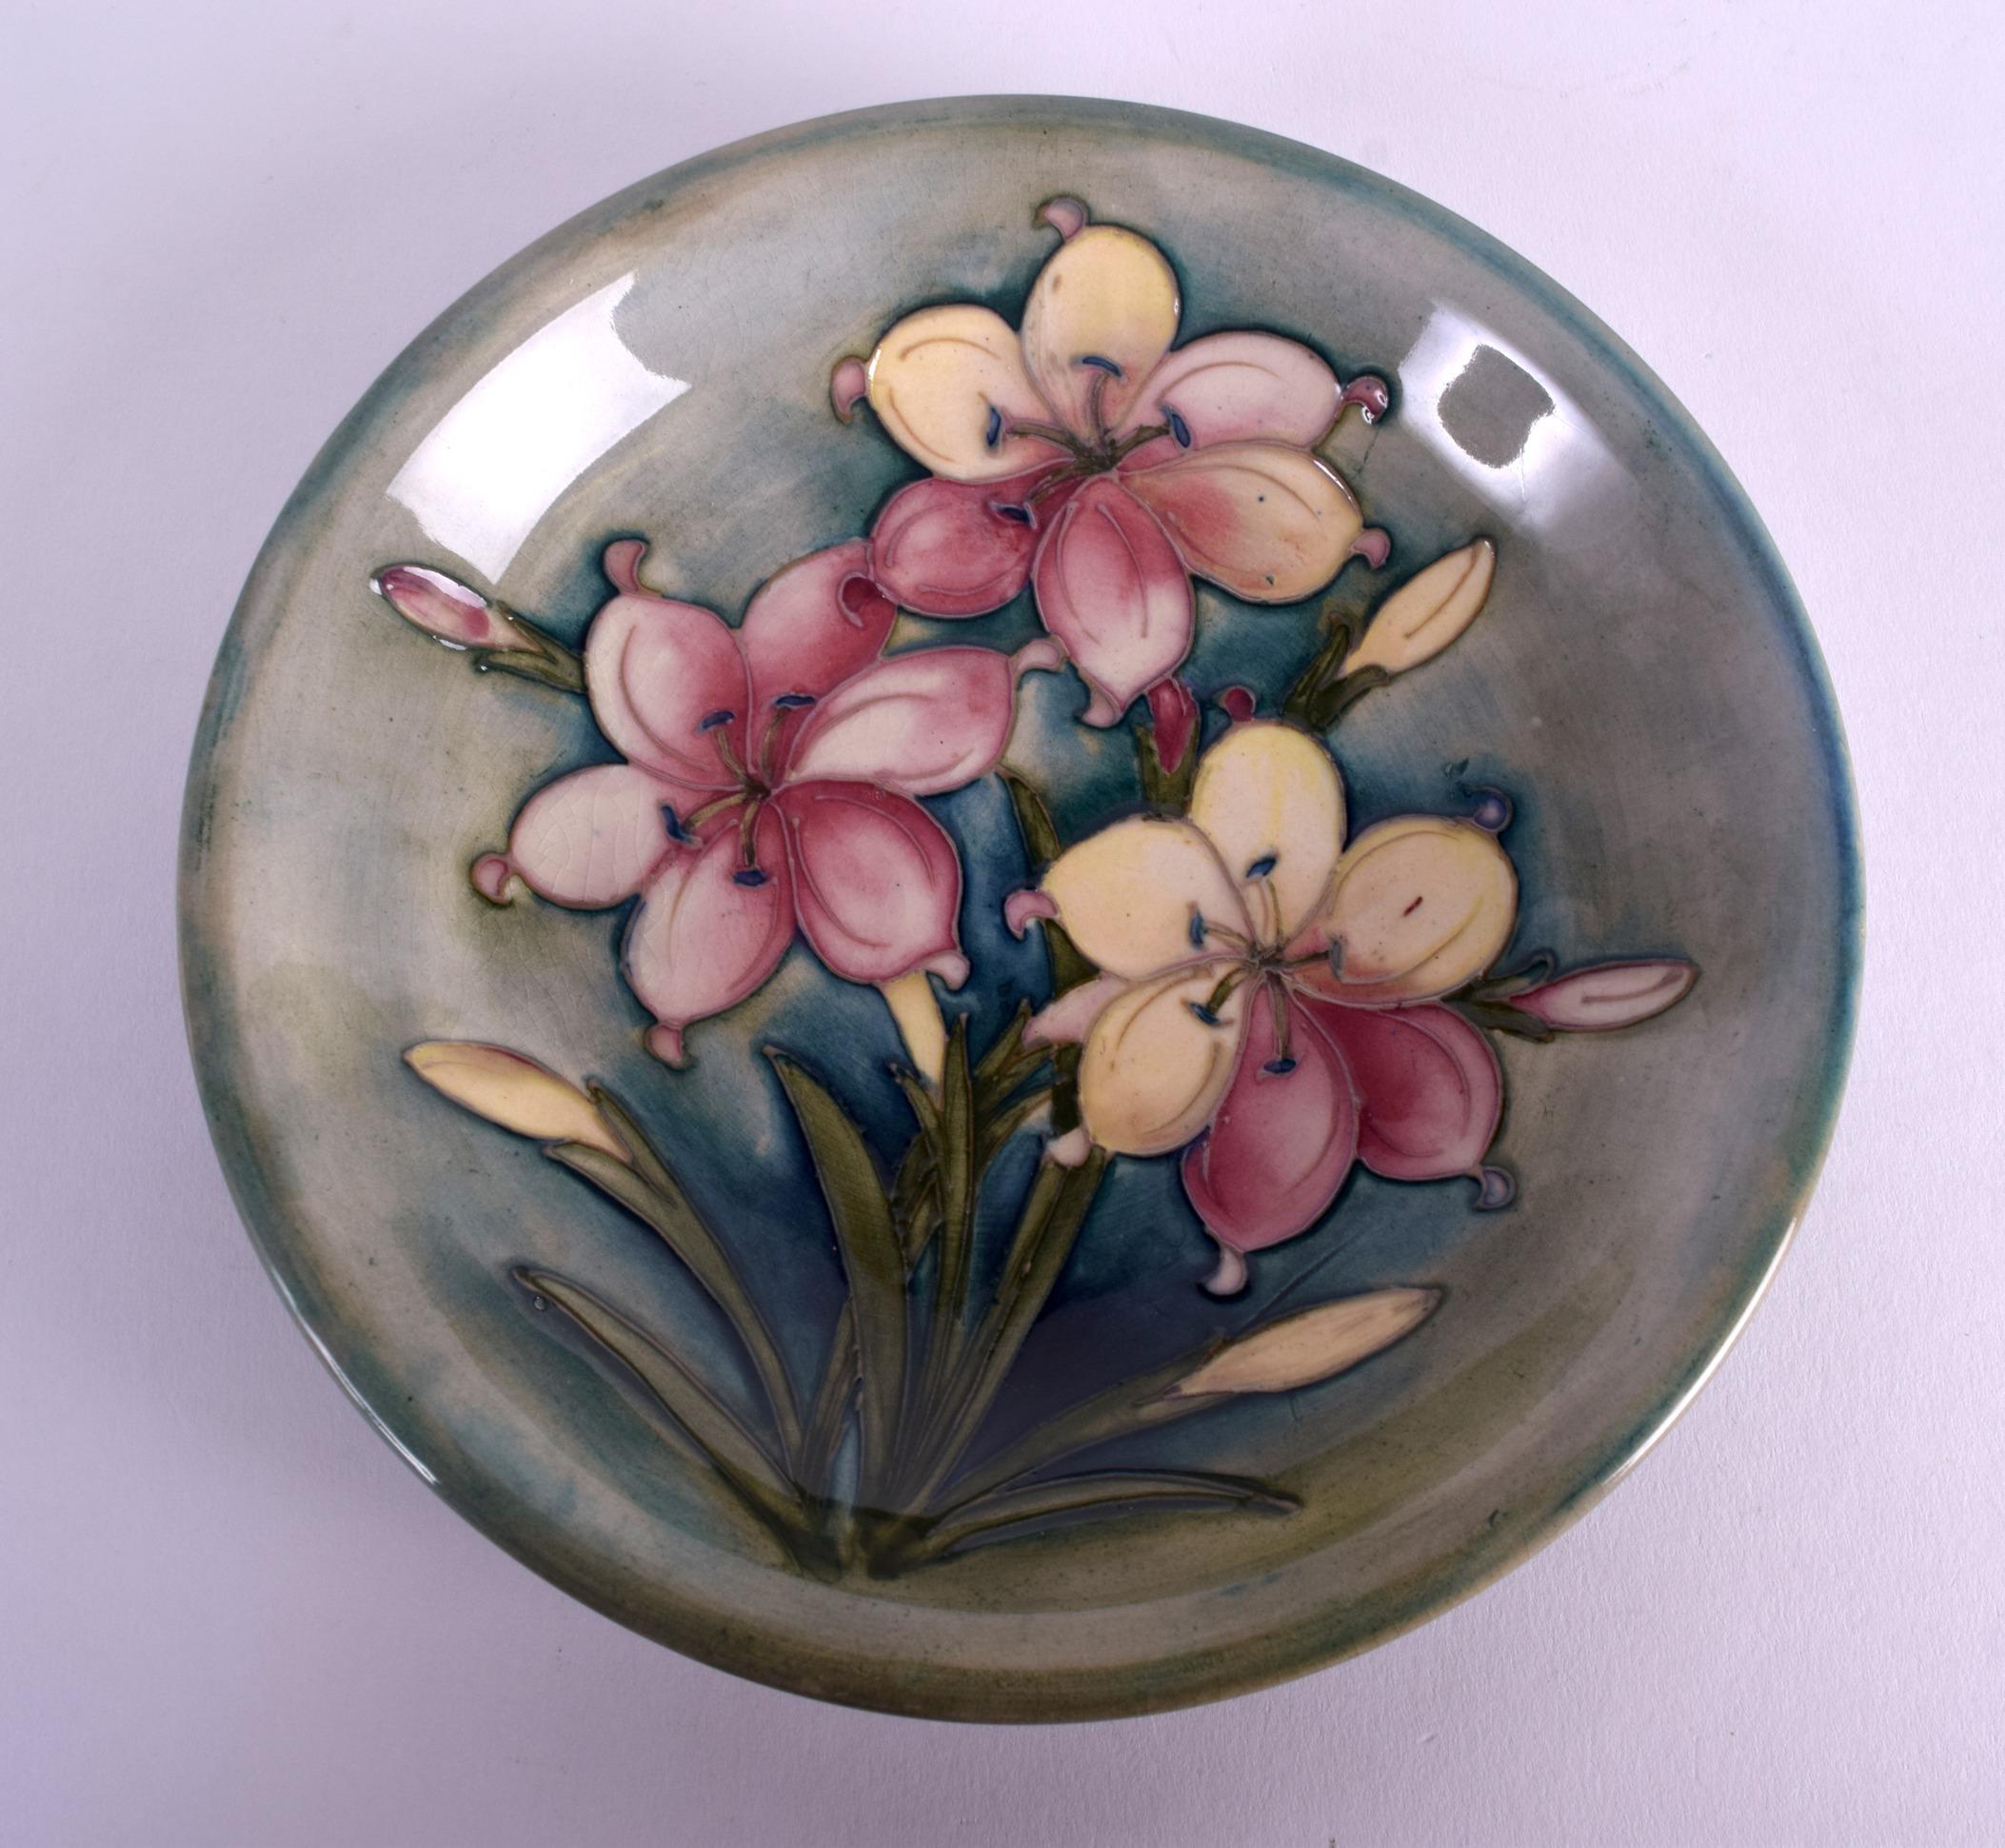 Lot 89 - A WILLIAM MOORCROFT CIRCULAR DISH decorated with three floral sprays. 18 cm diameter.